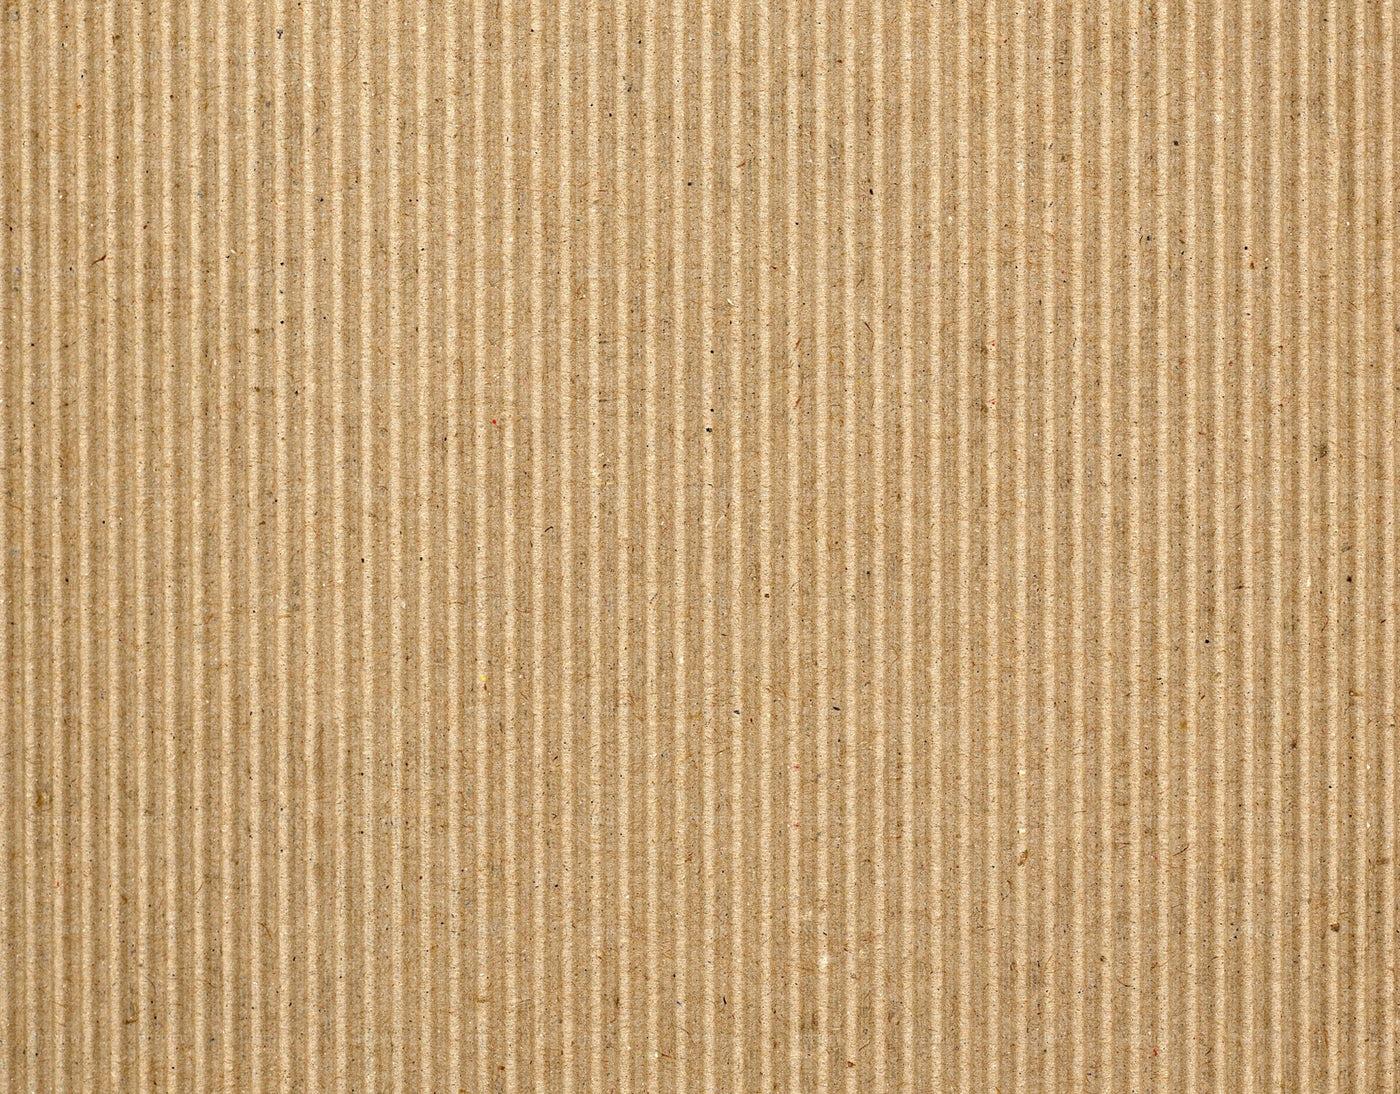 Corrugated Cardboard: Stock Photos